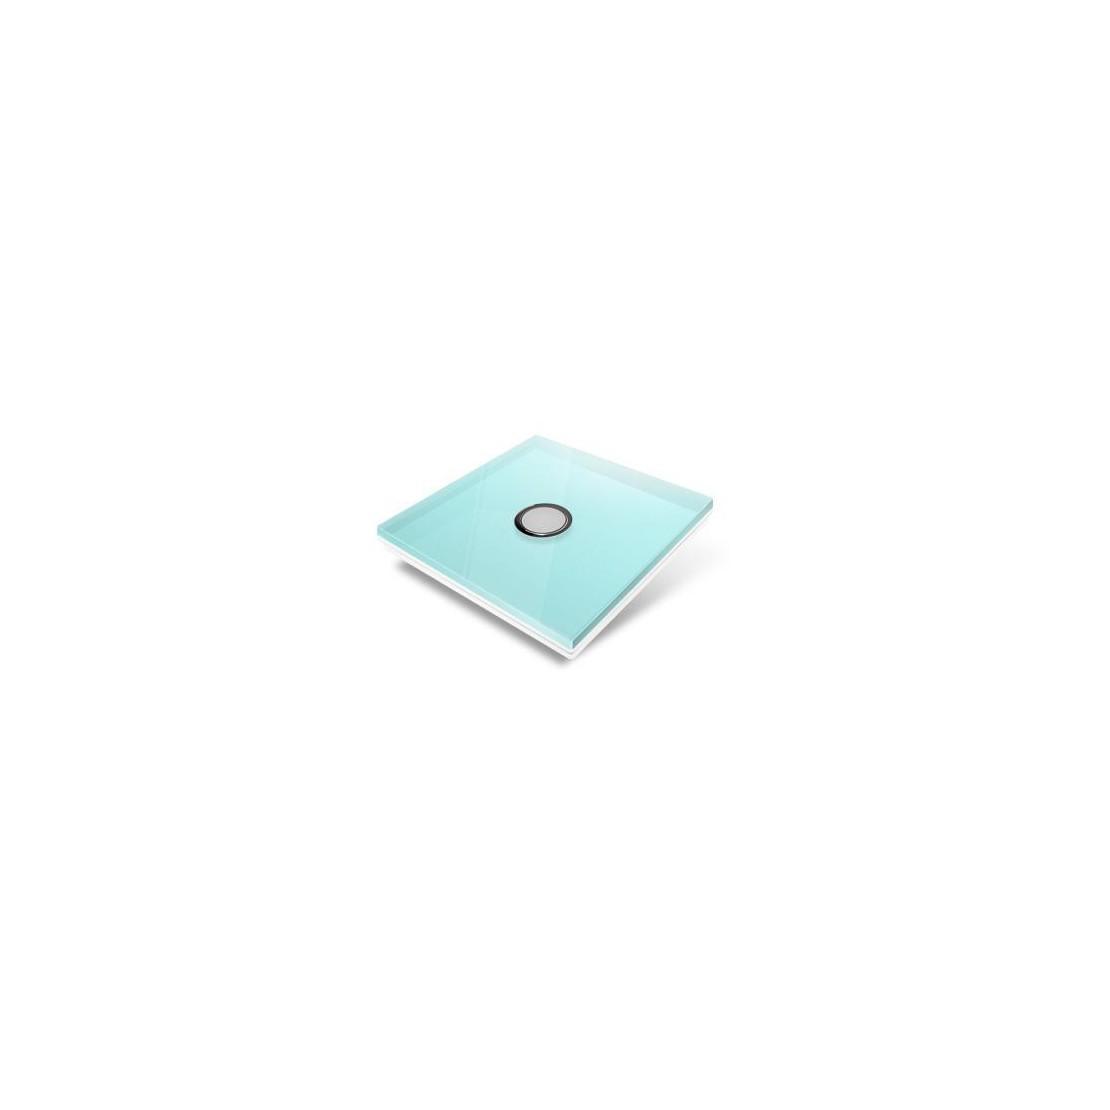 Tampa de cobertura para interruptor Edisio - cristal azul-claro